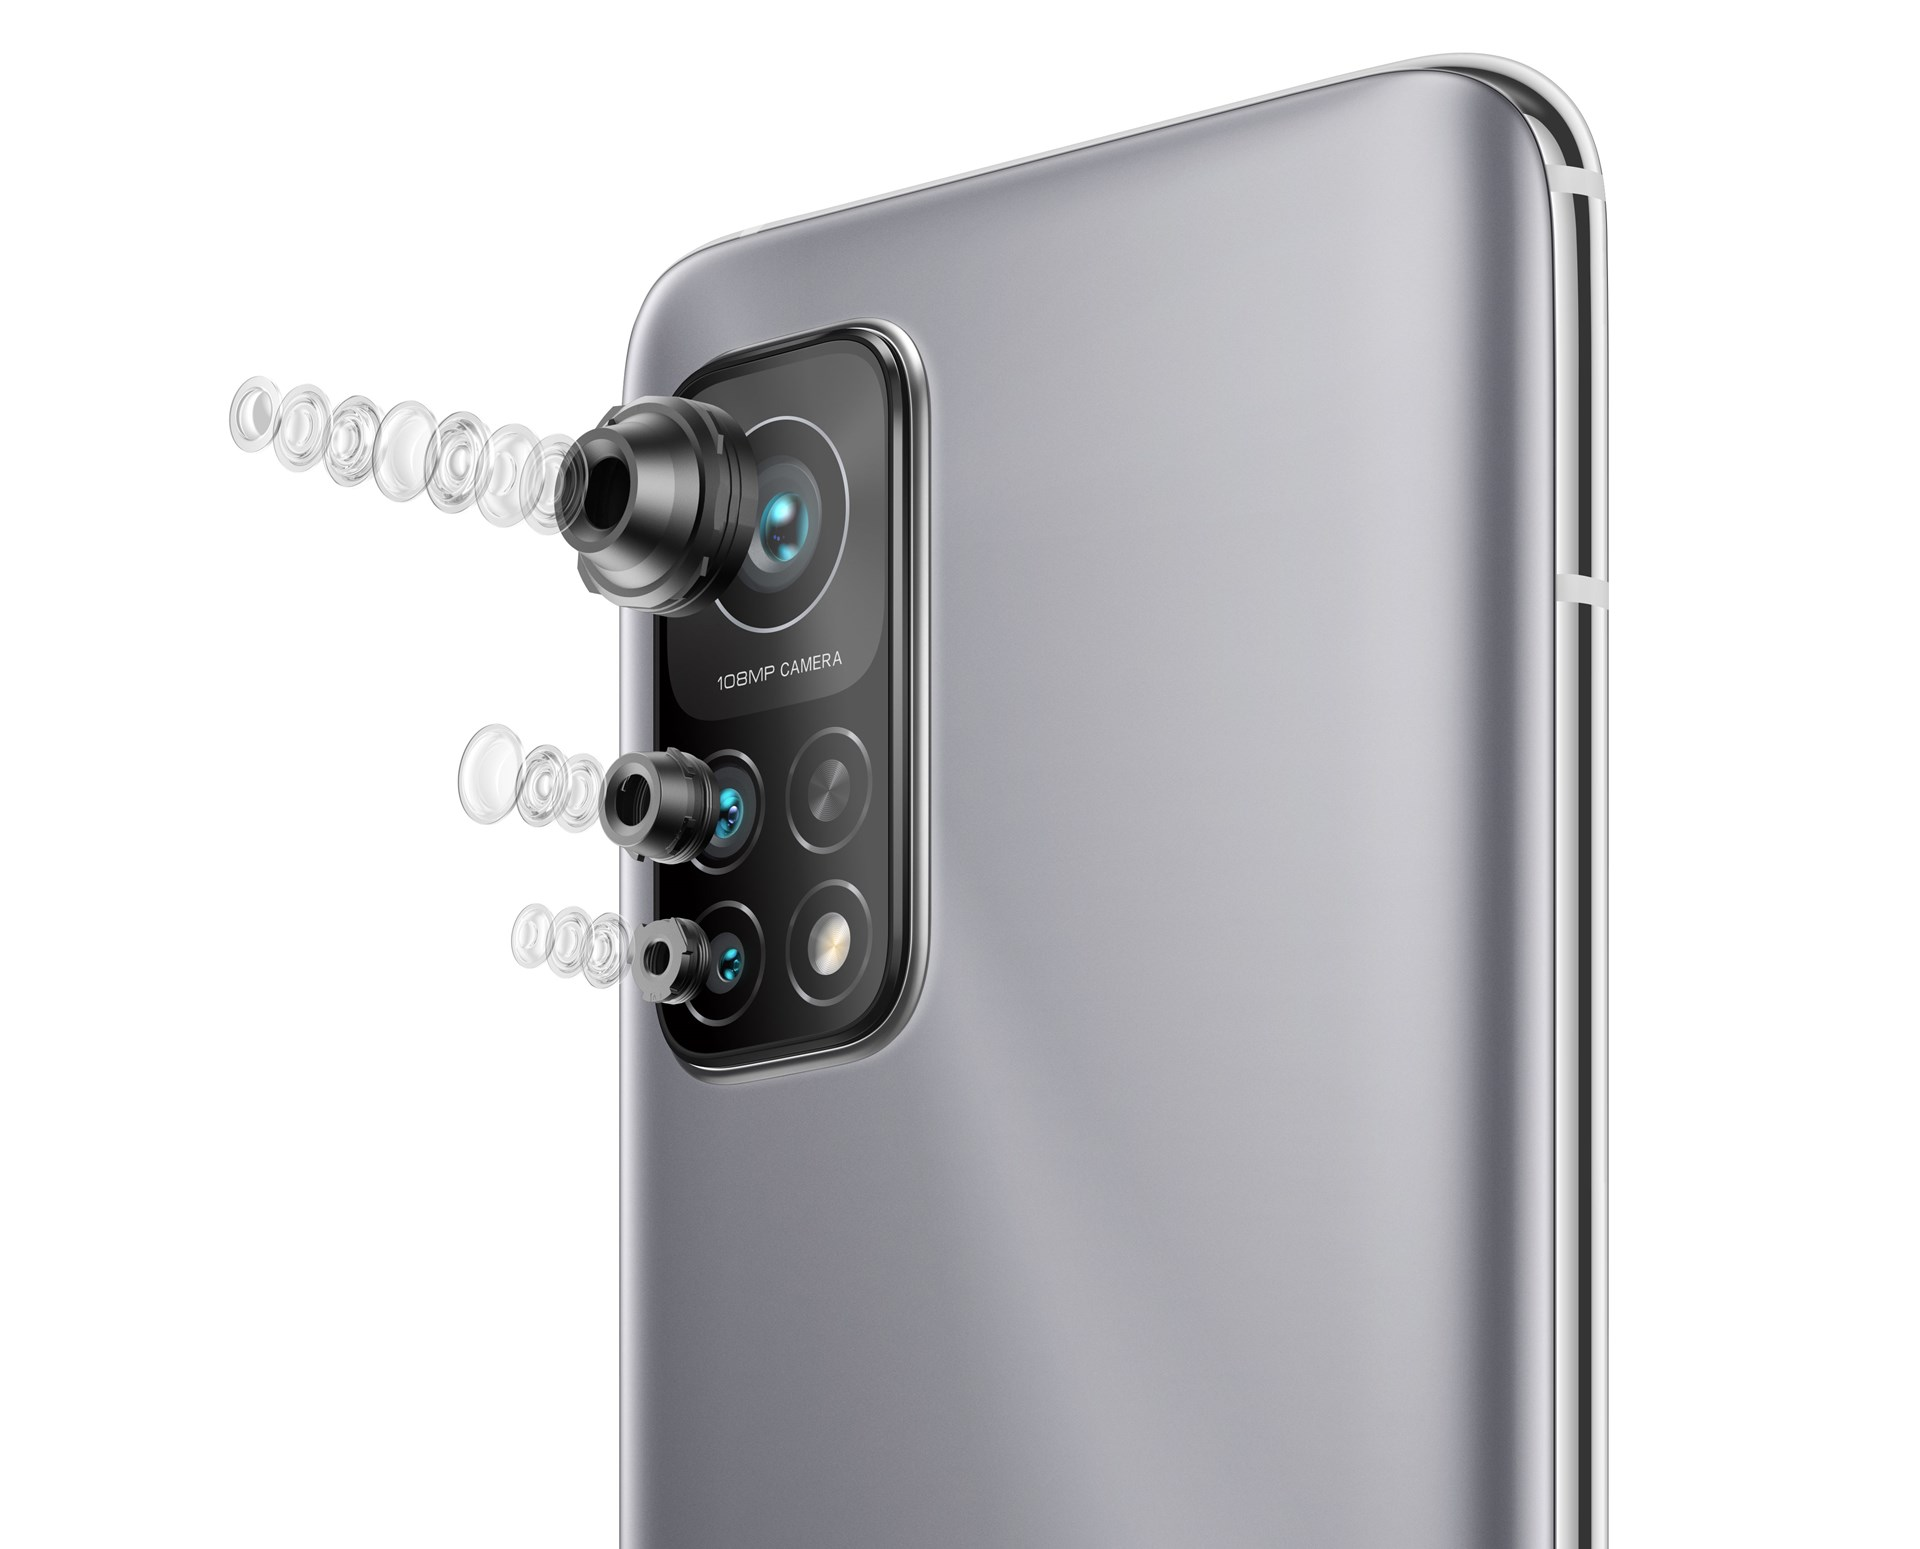 Xiaomi Mi 10T Pro mobiltelefon med 108 megapixel trippelkamera